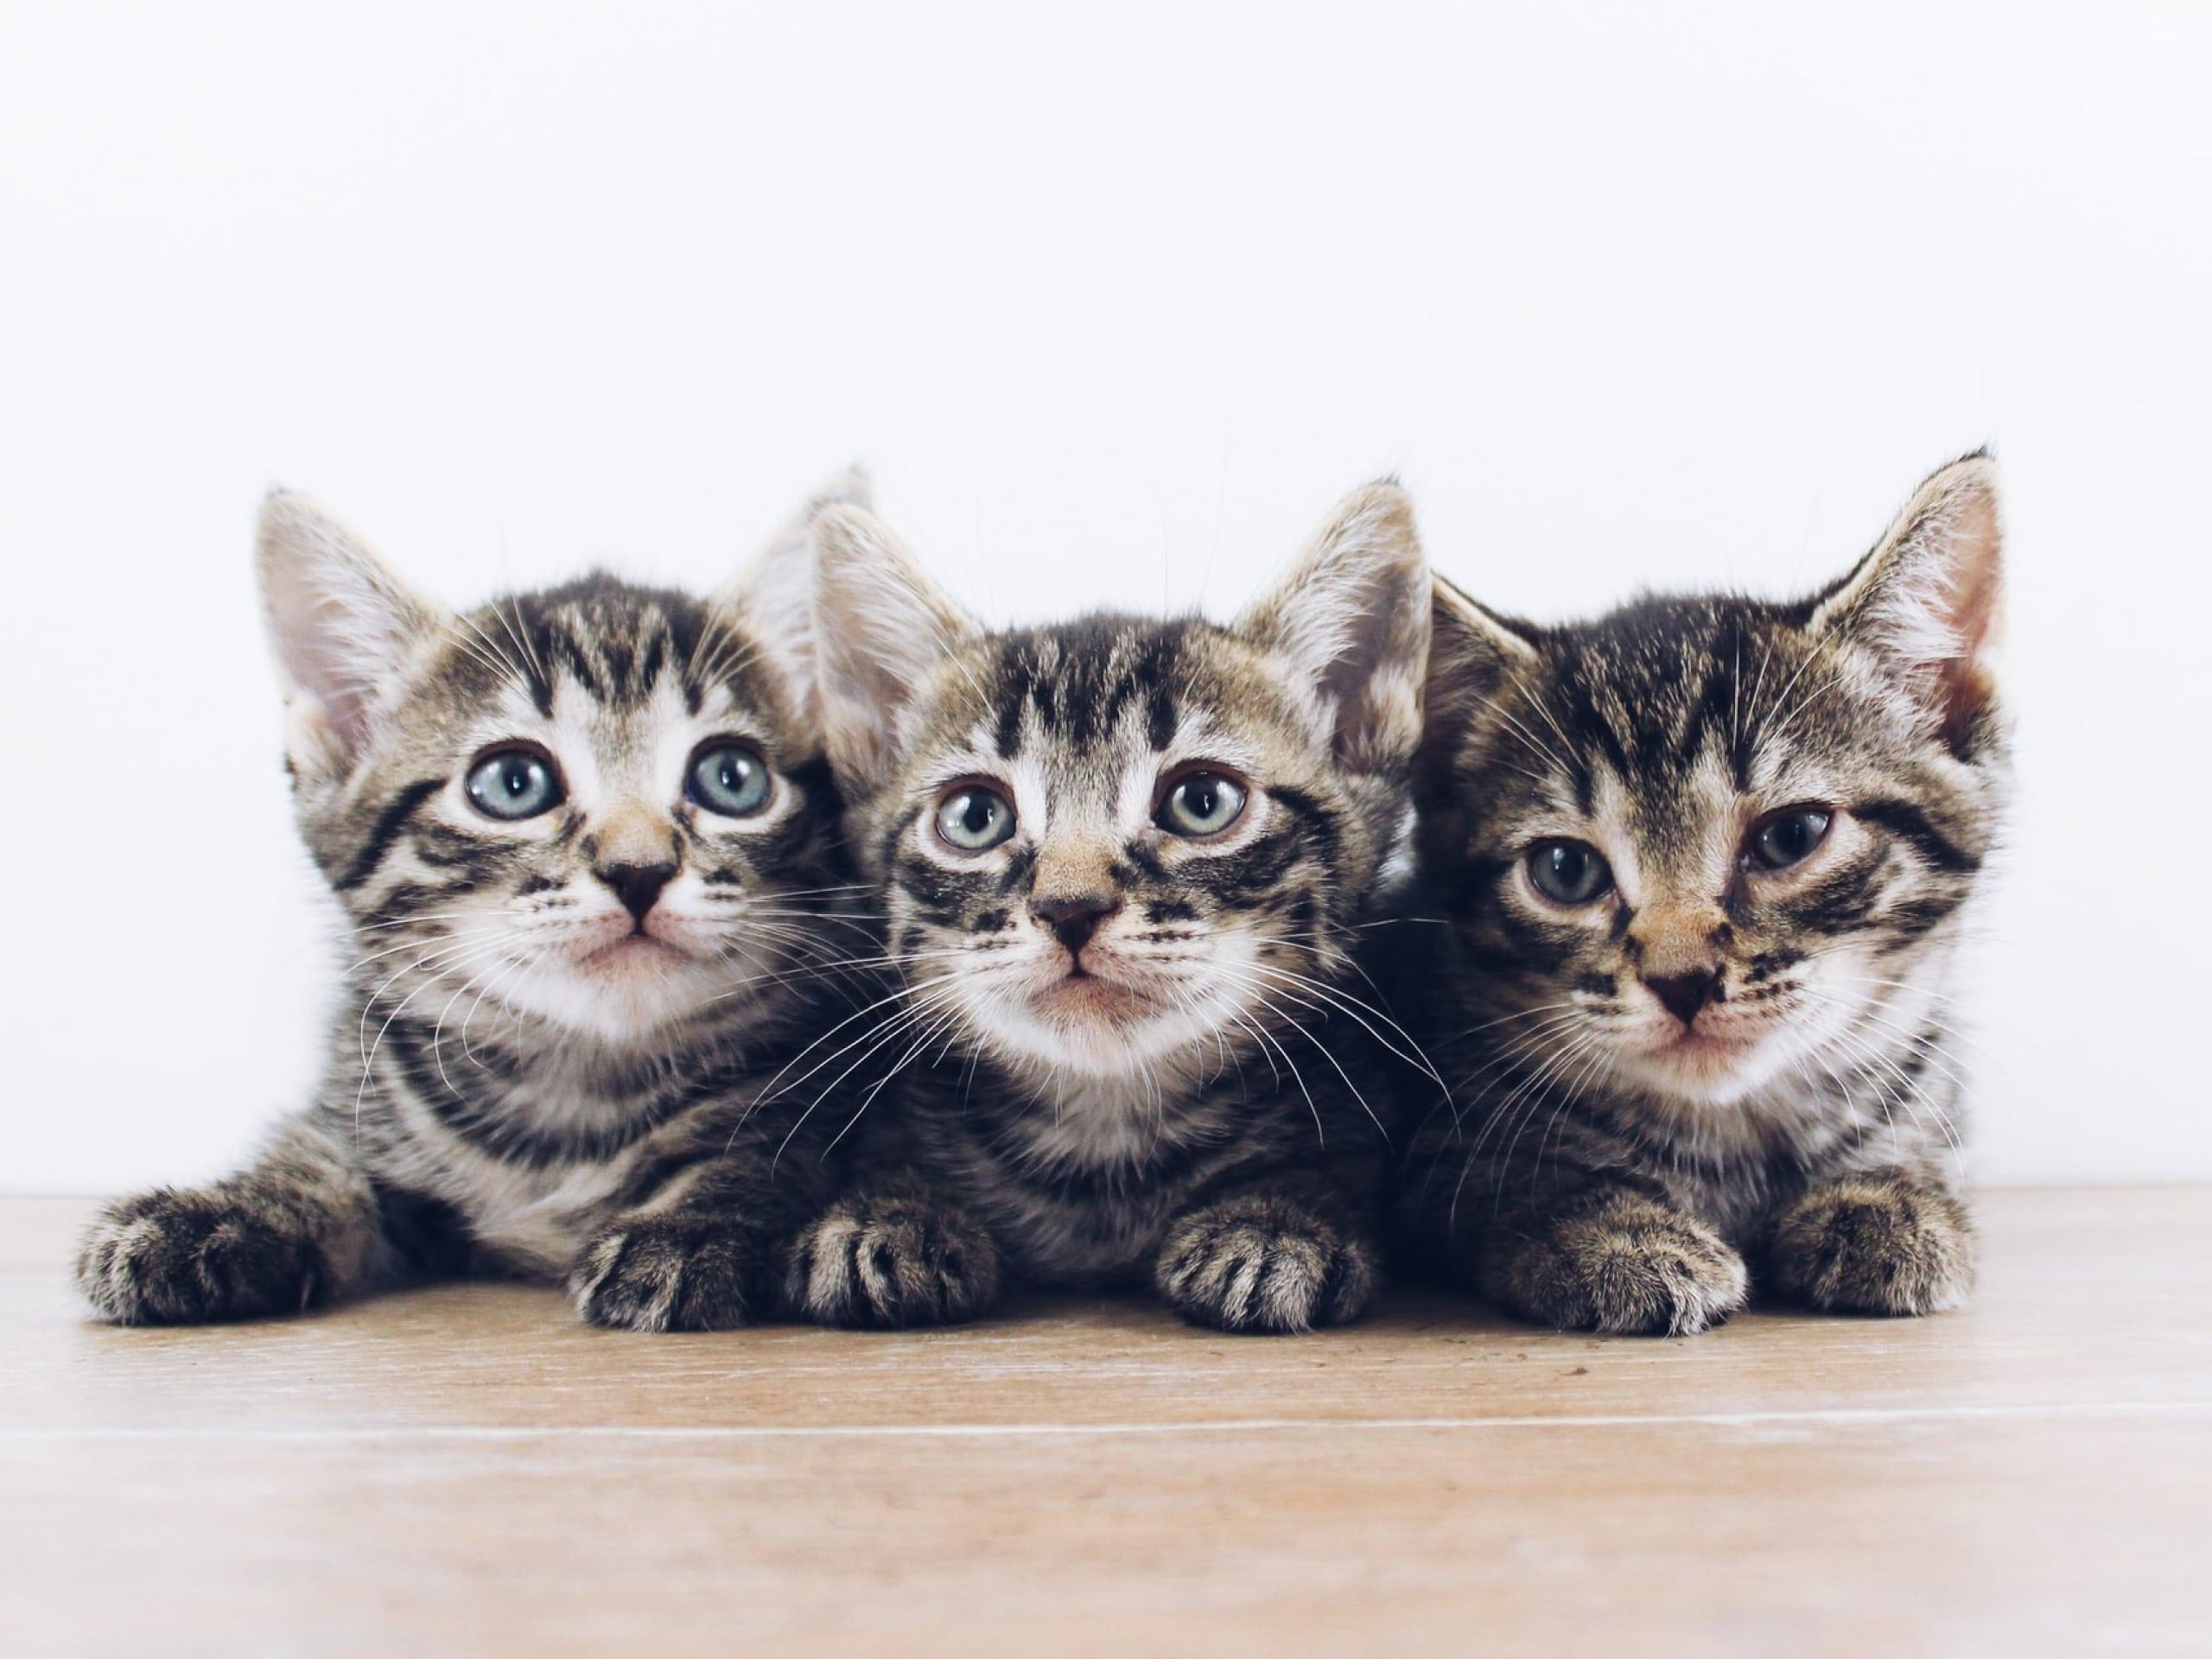 Three kittens look into the camera.